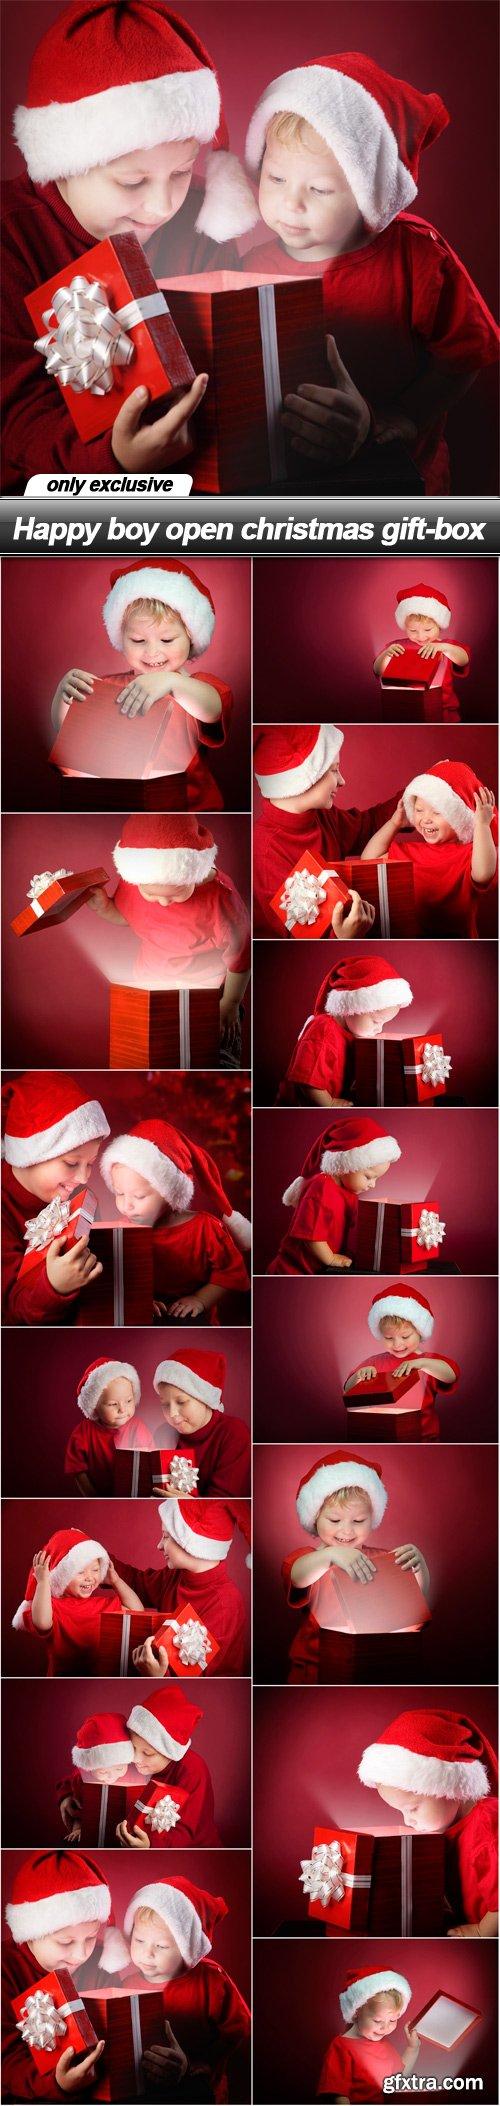 Happy boy open christmas gift-box - 15 UHQ JPEG